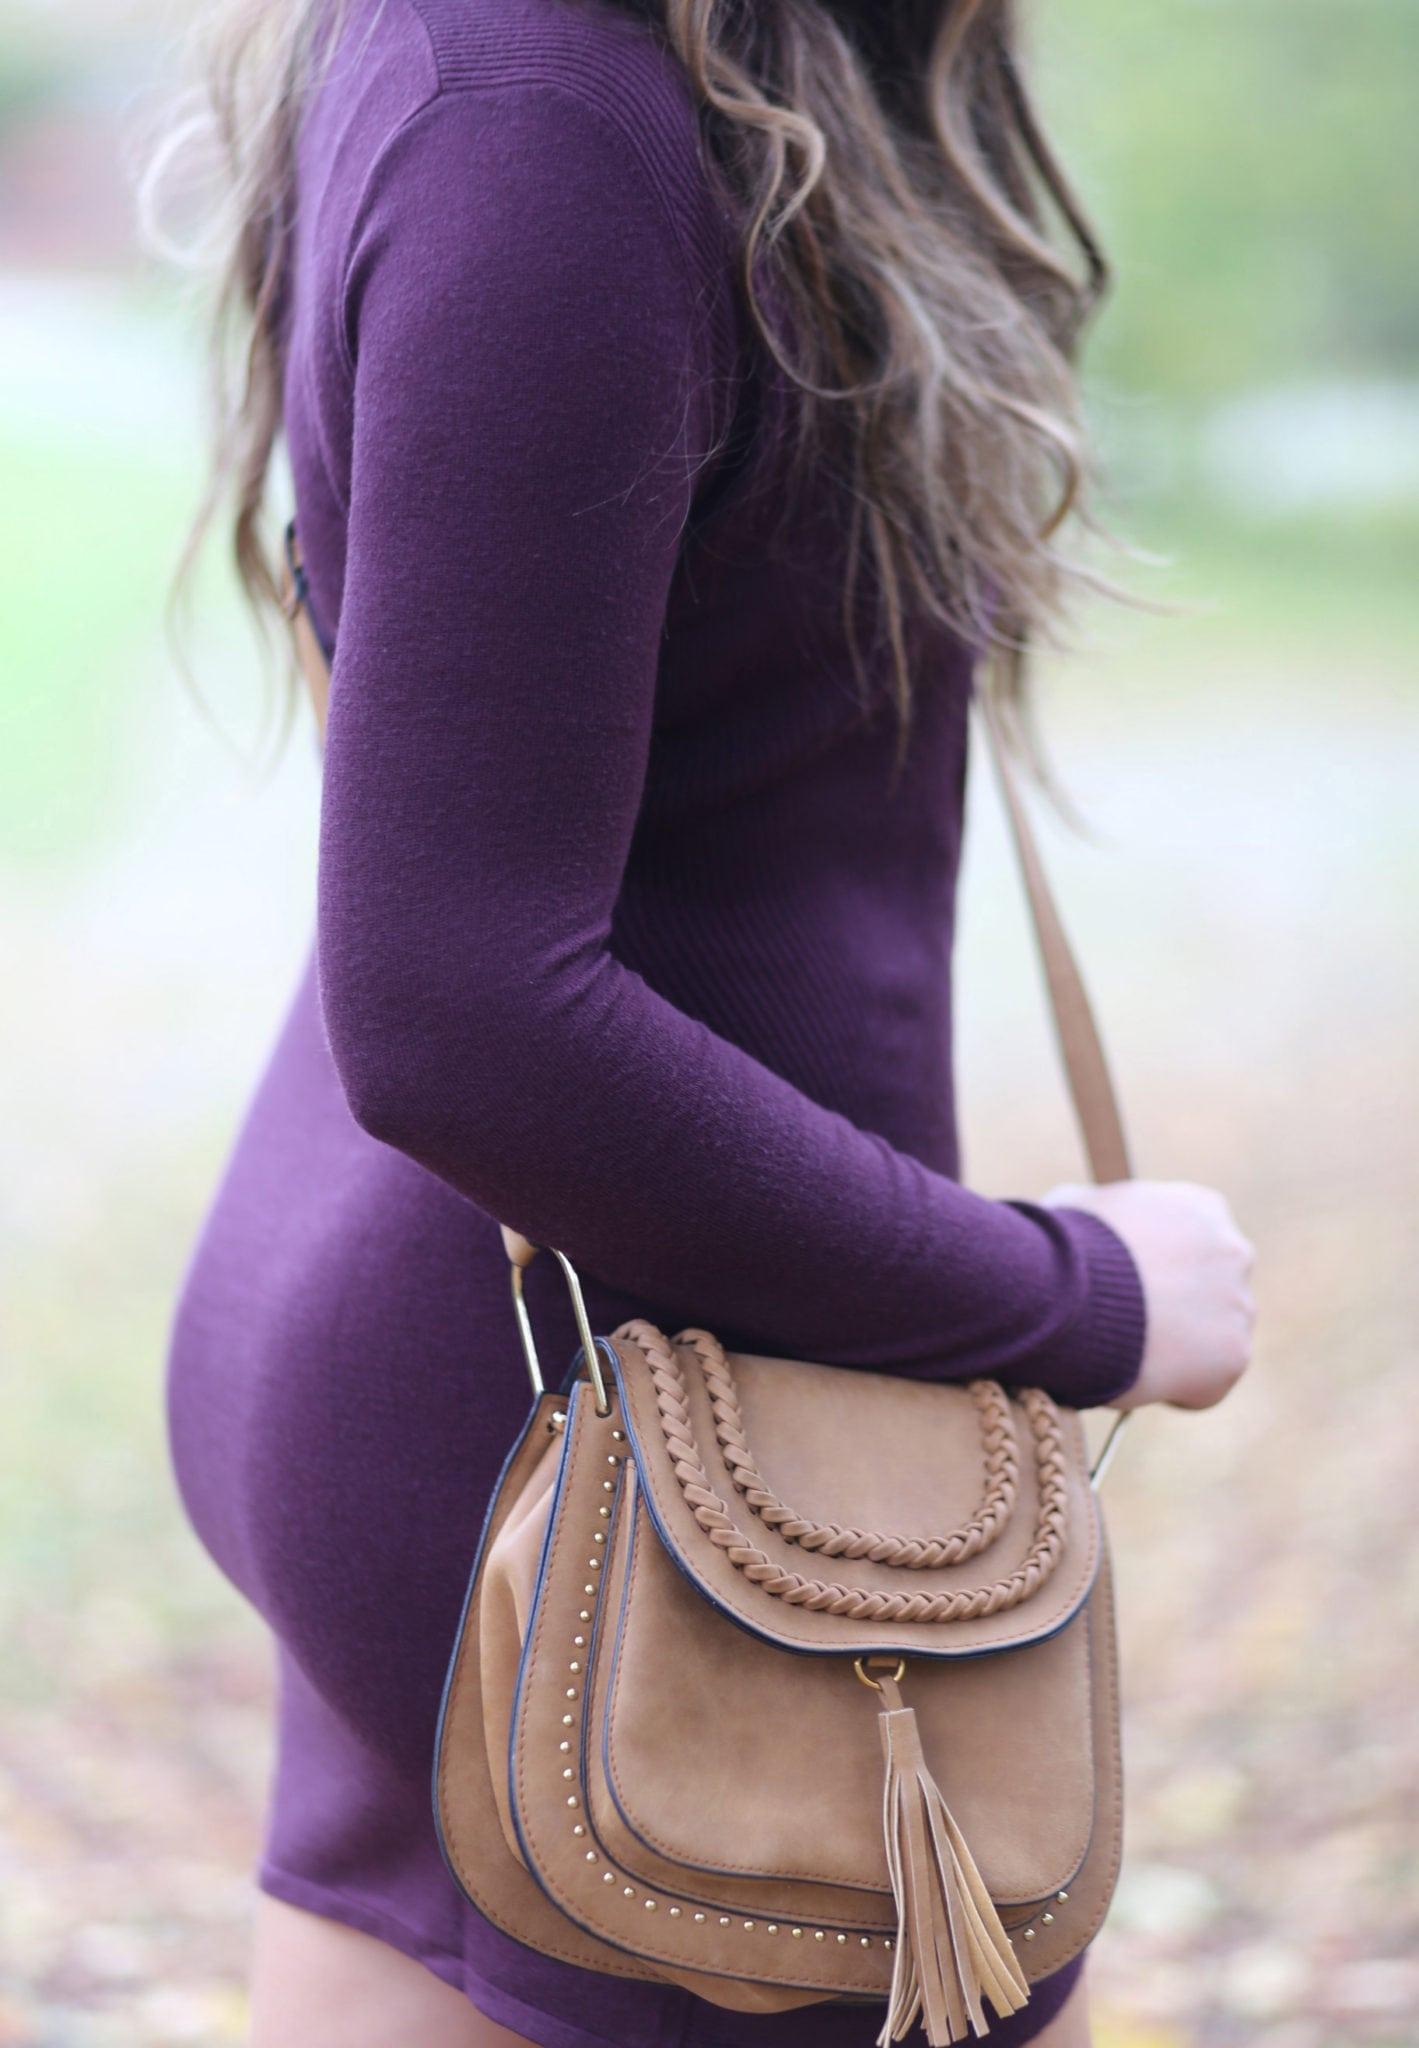 Style blogger Mash Elle shares a cute purple flattering fall dress